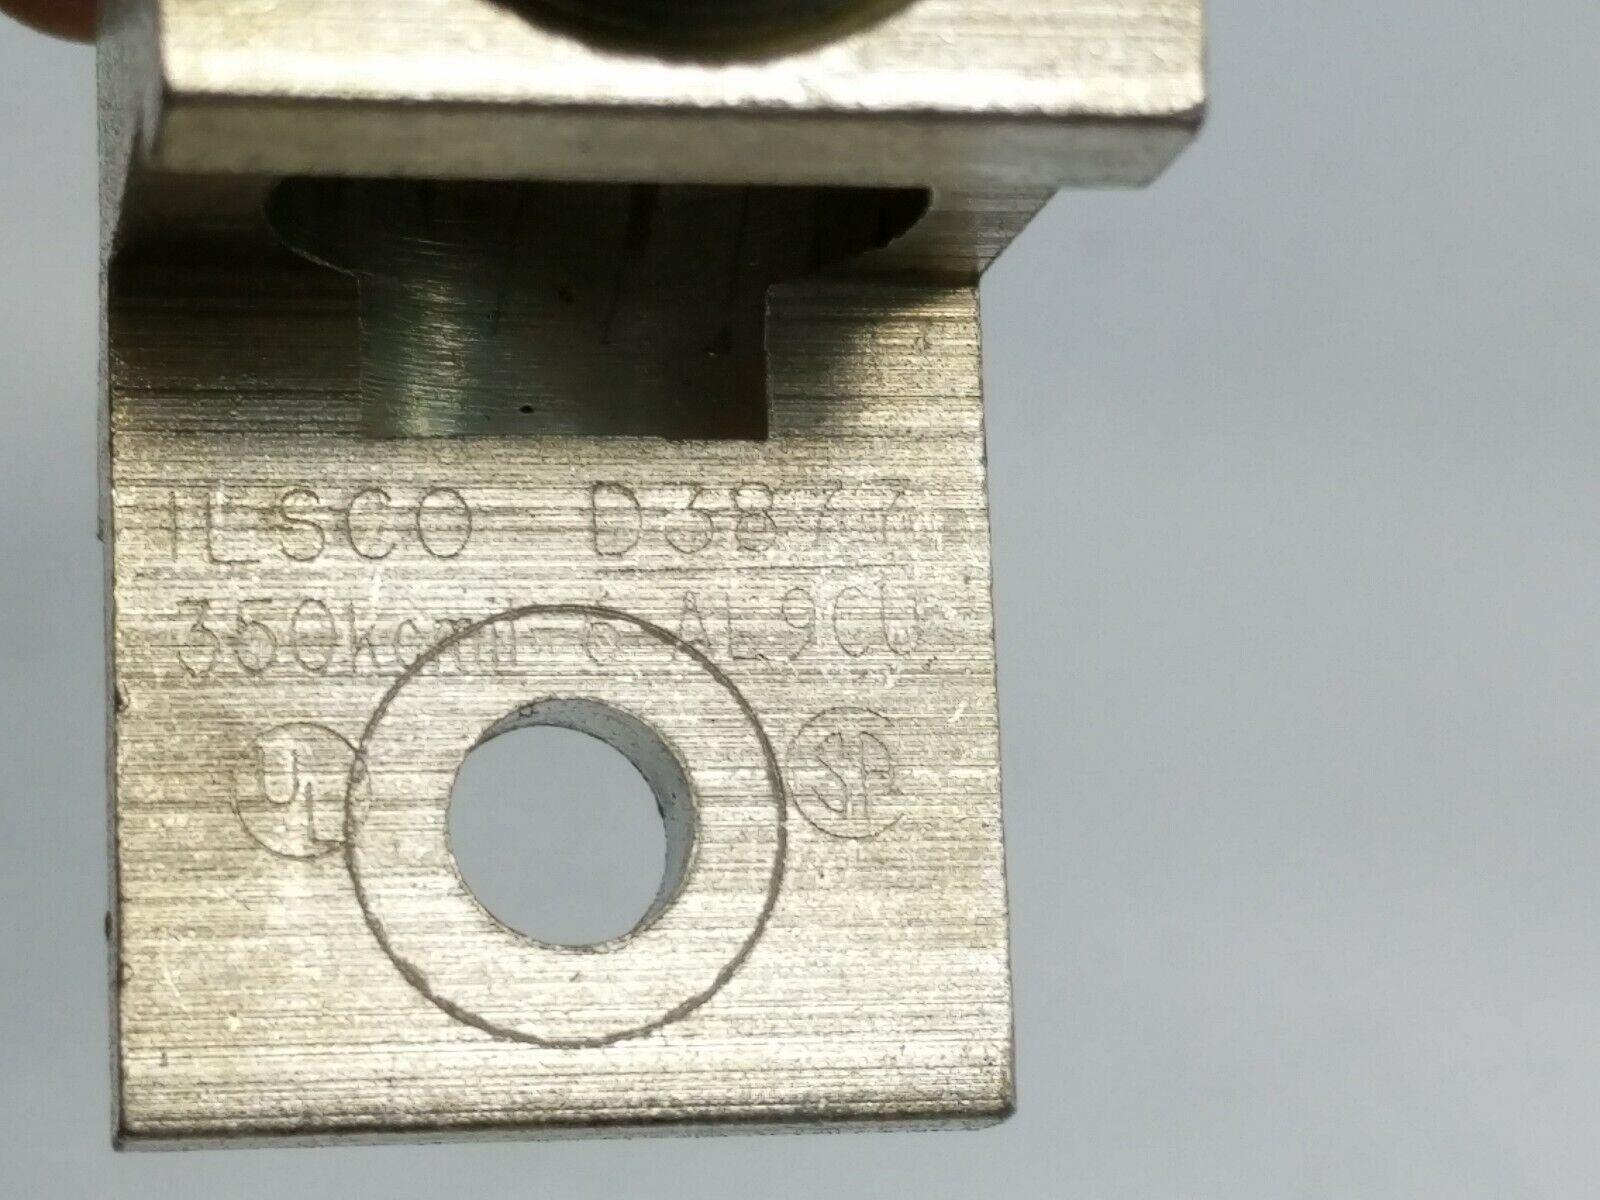 FABORY M01200.120.0300 HHCS,M12-1.75x300mm,Stl,Gr 8.8,ZP,PK5